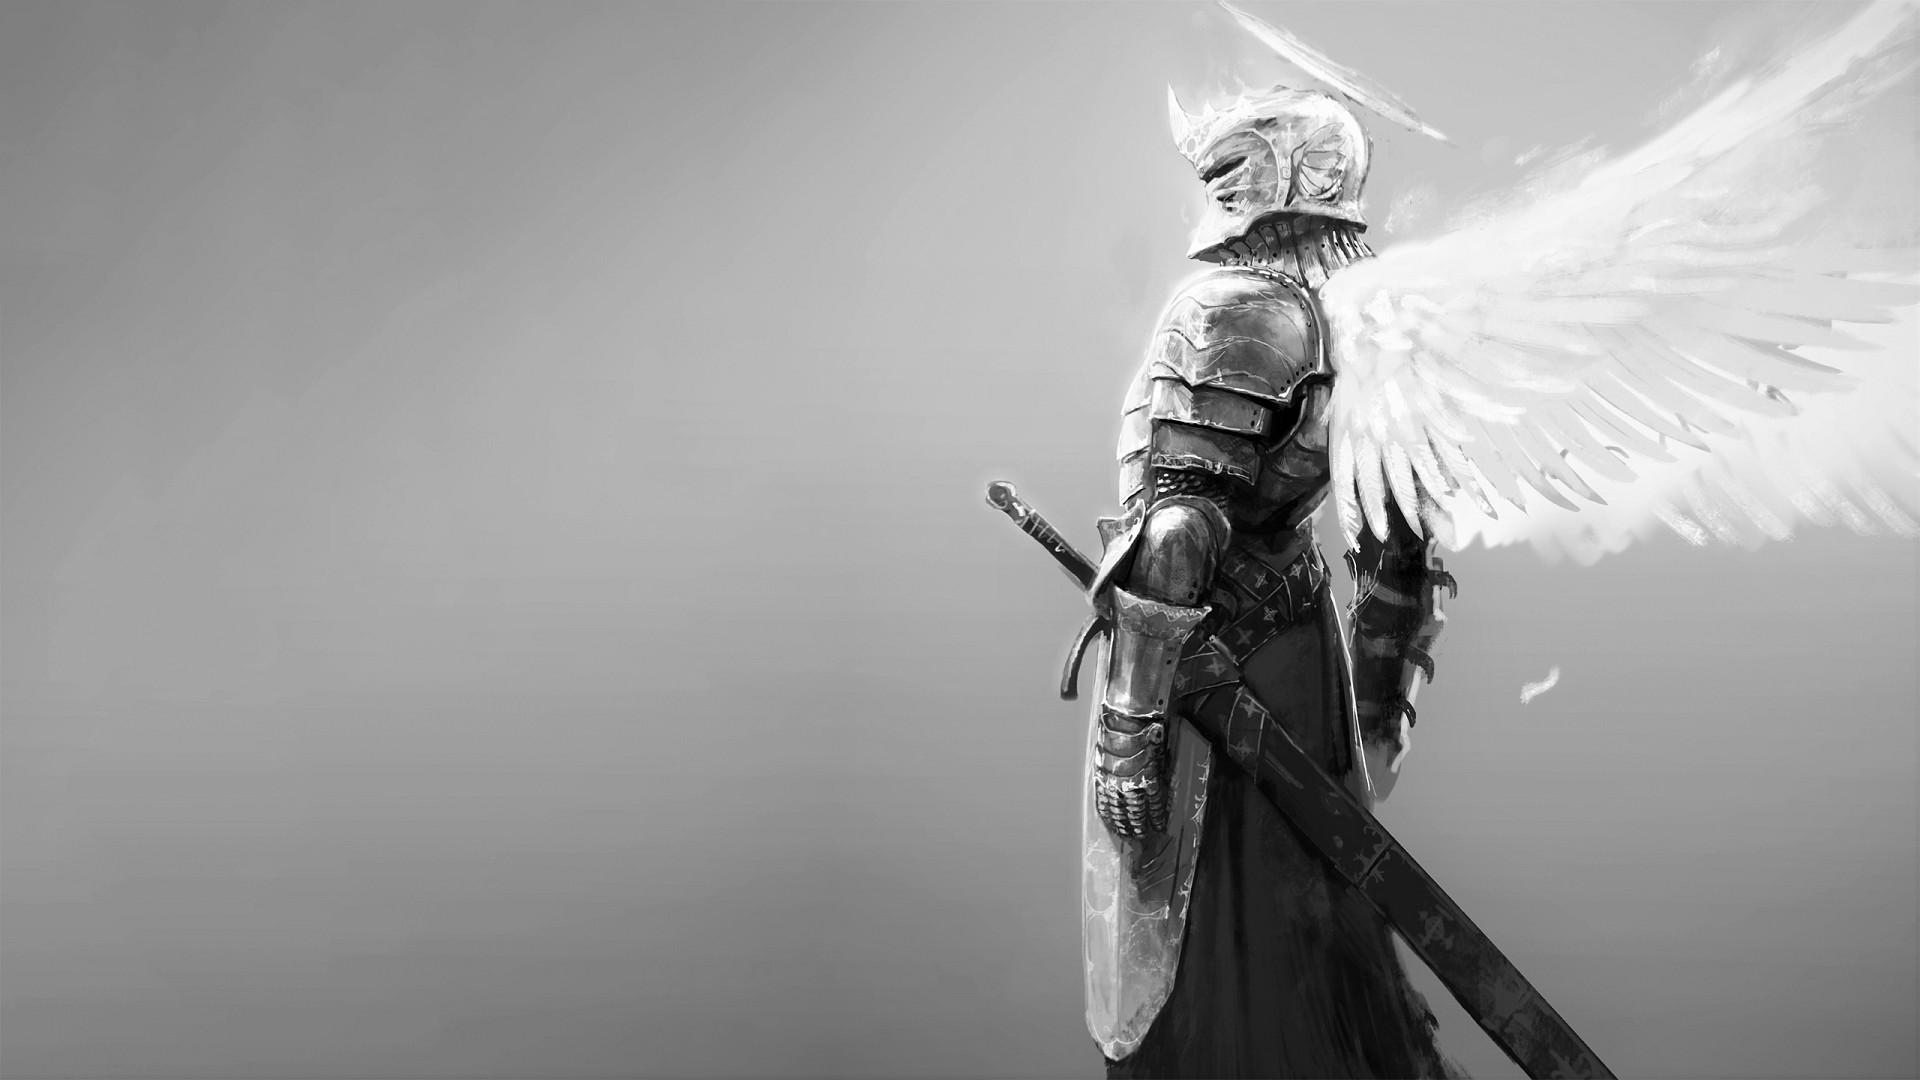 Георгина дарк ангел дракула фото скандинавских странах